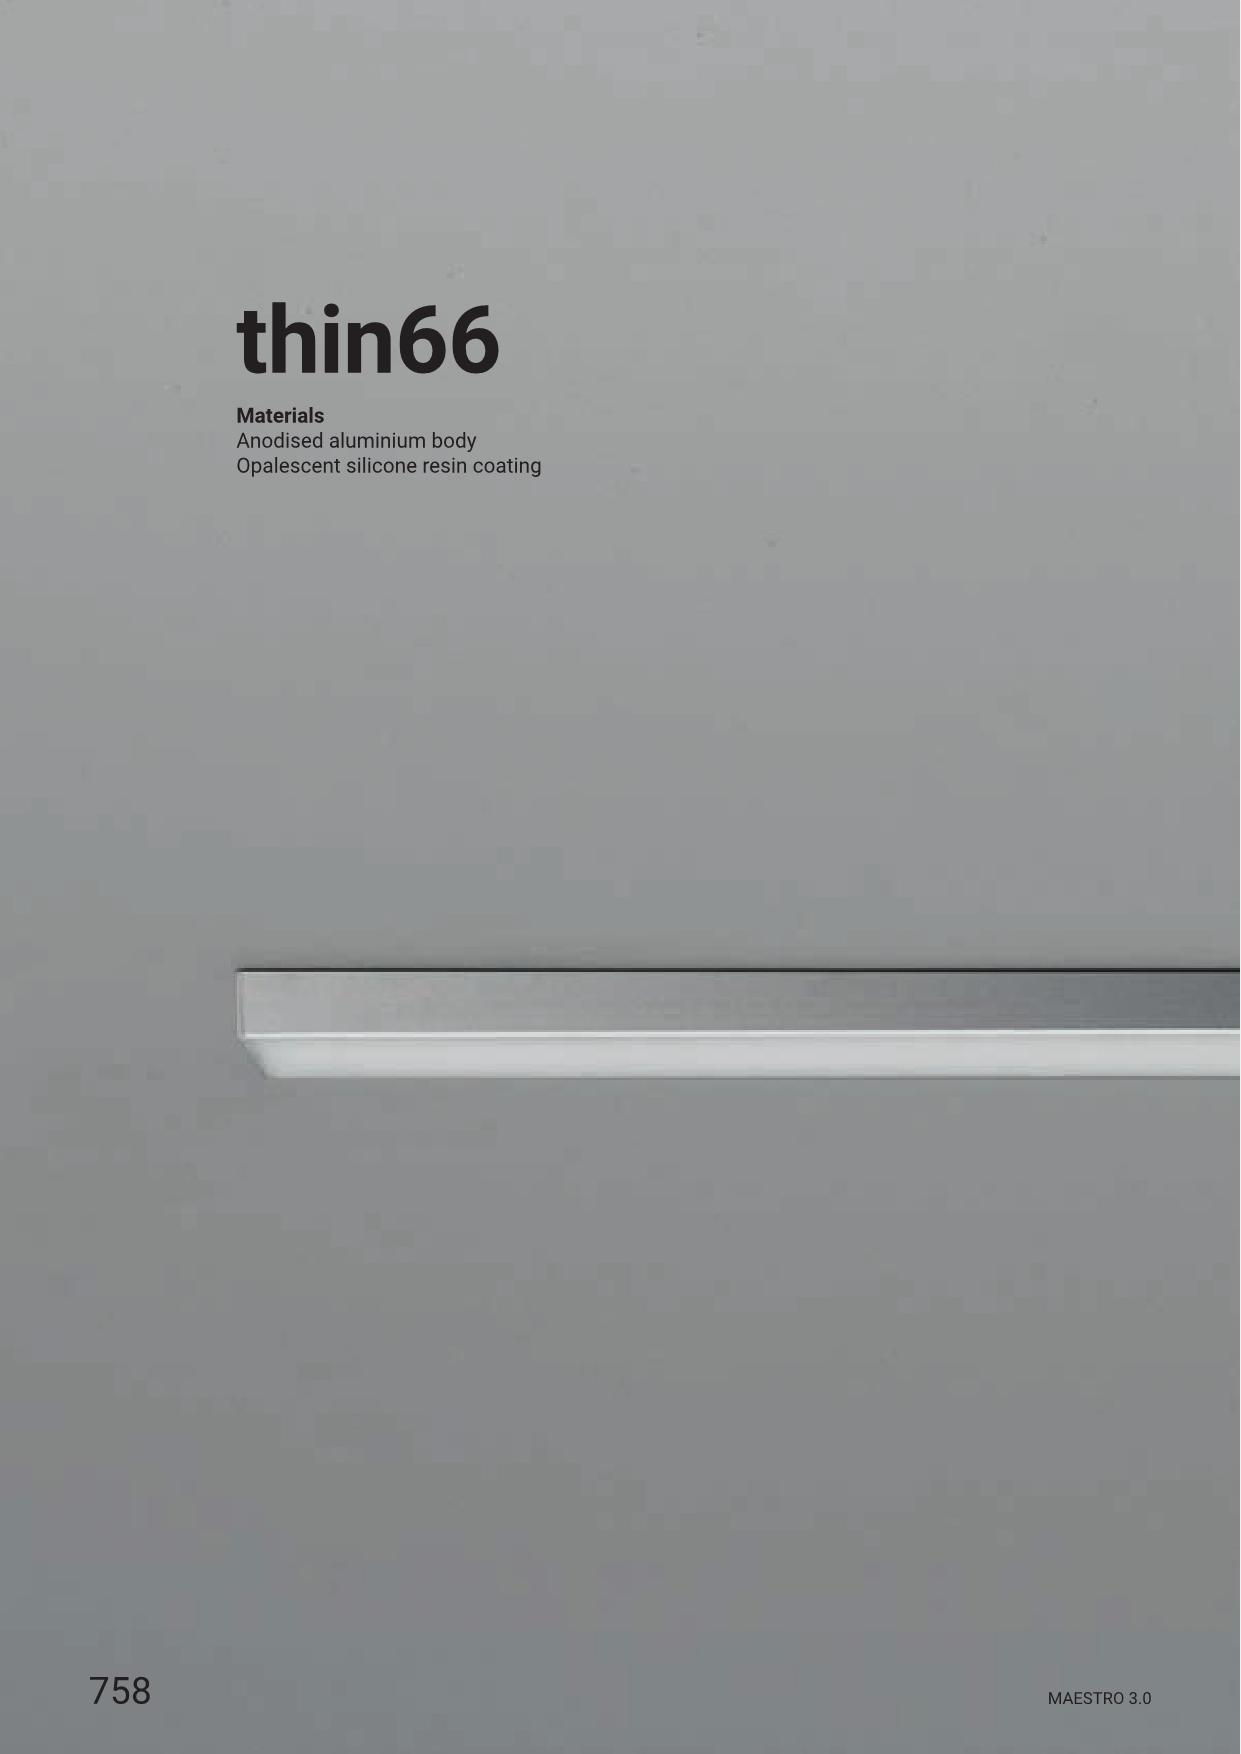 Linea Light – Thin66